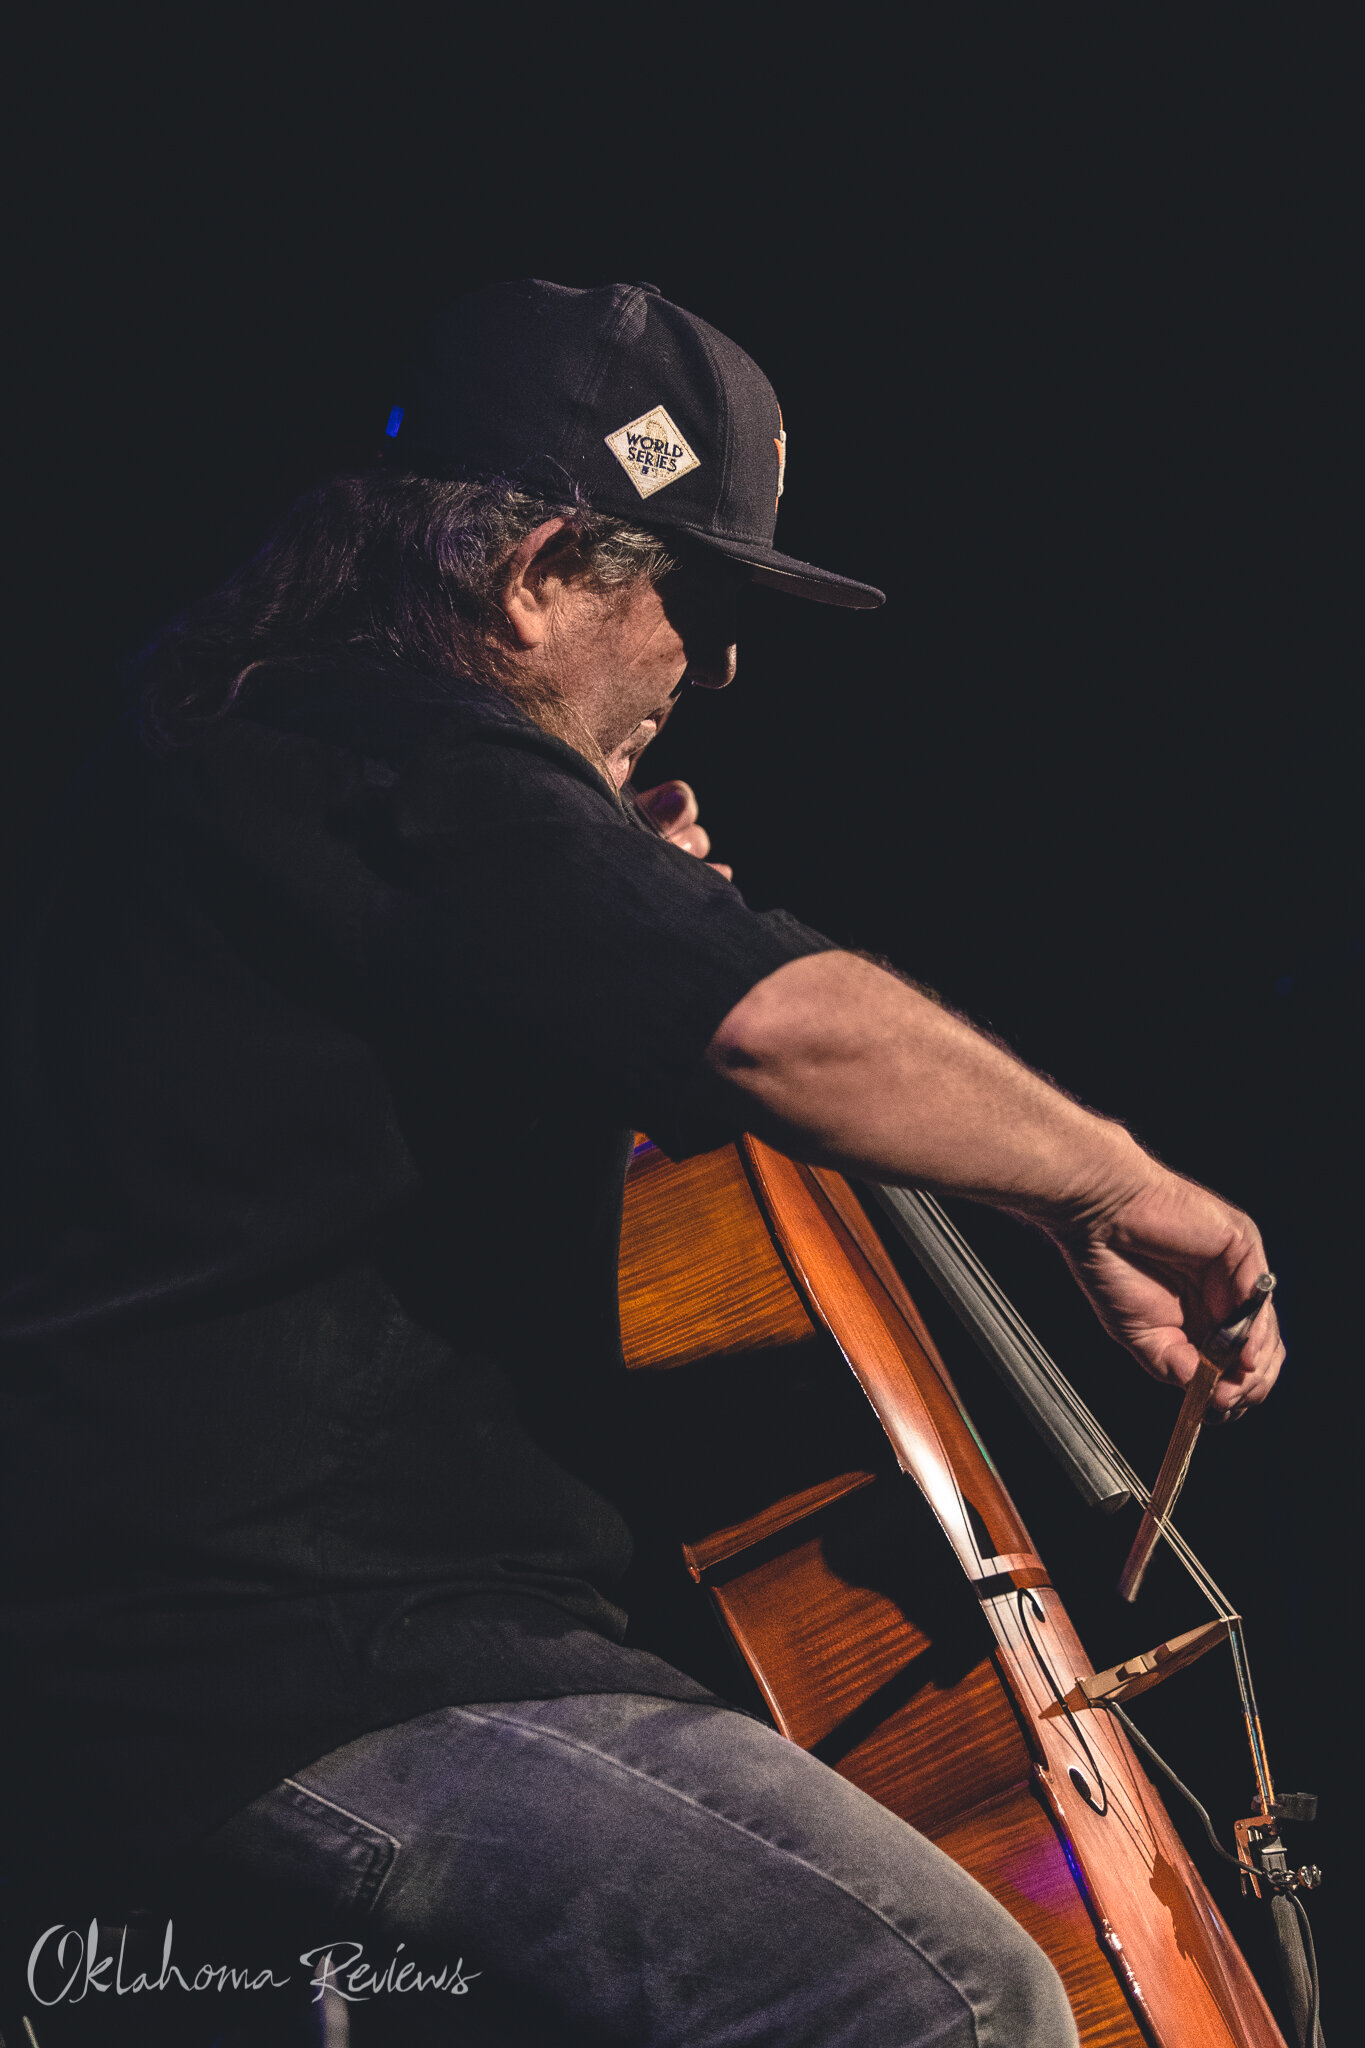 Mark Williams Cellist | The Oklahoma Reviews